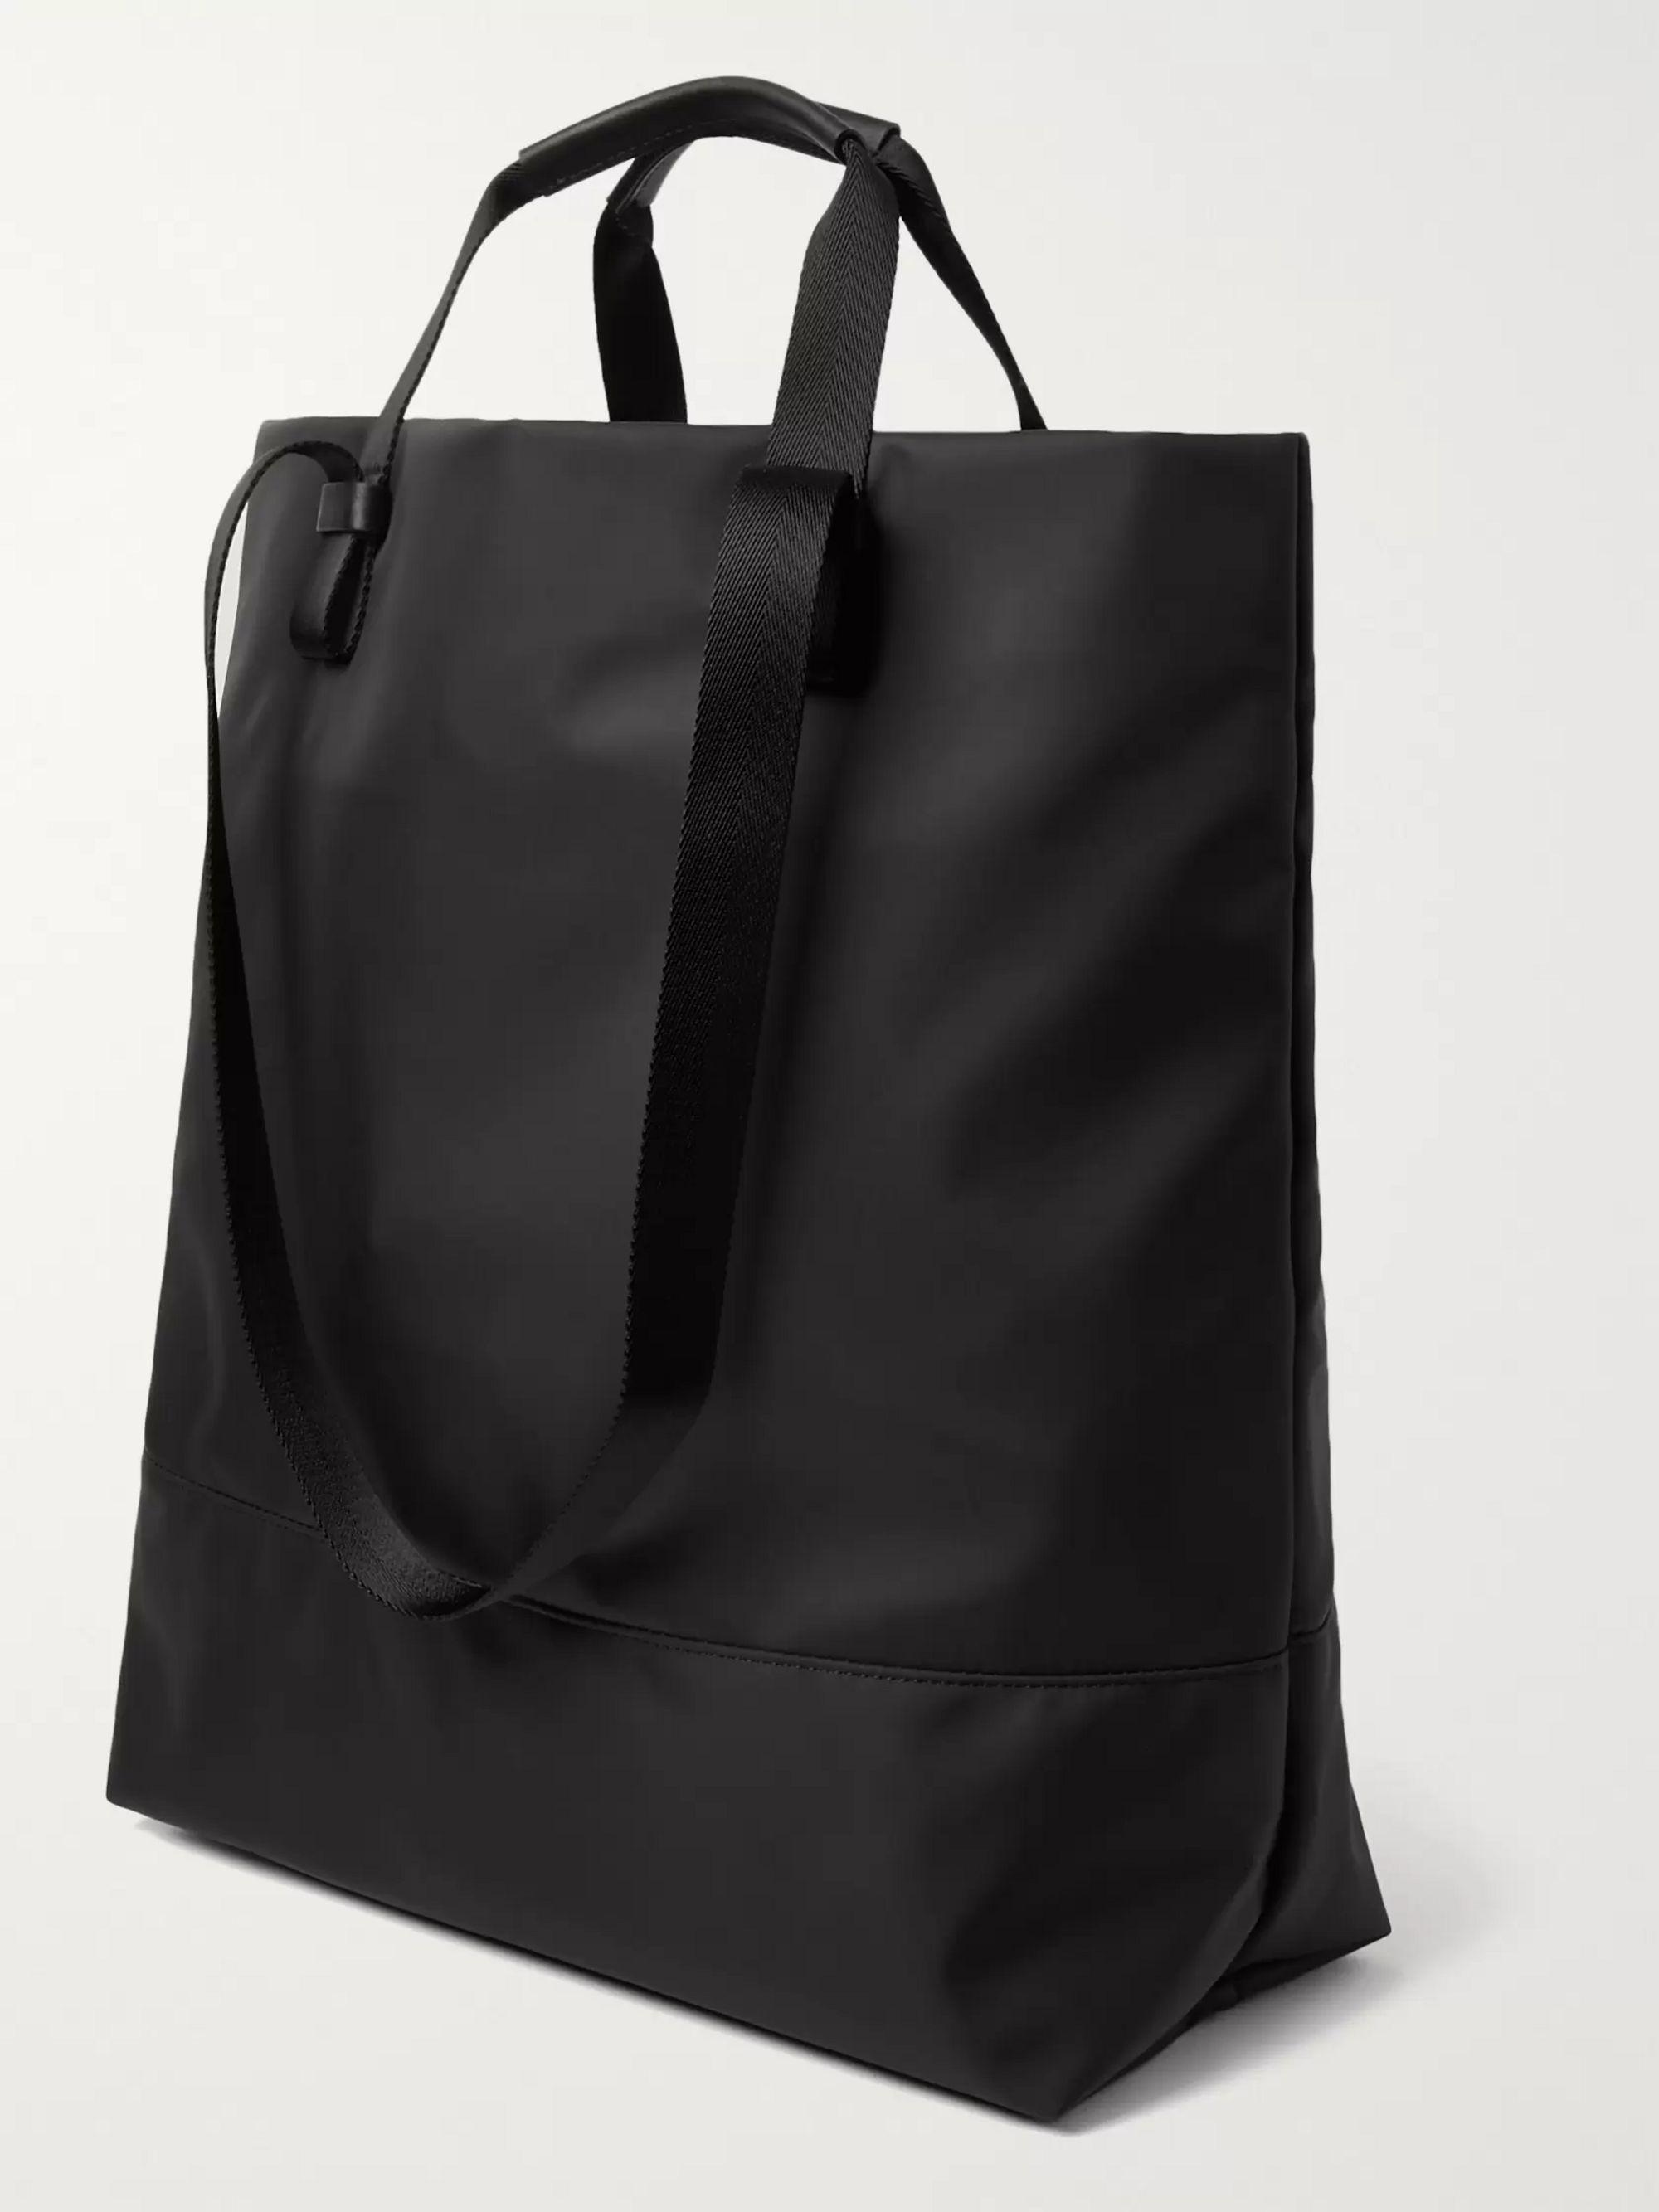 Black Dayton Leather-trimmed Nylon Tote Bag | Want Les Essentiels